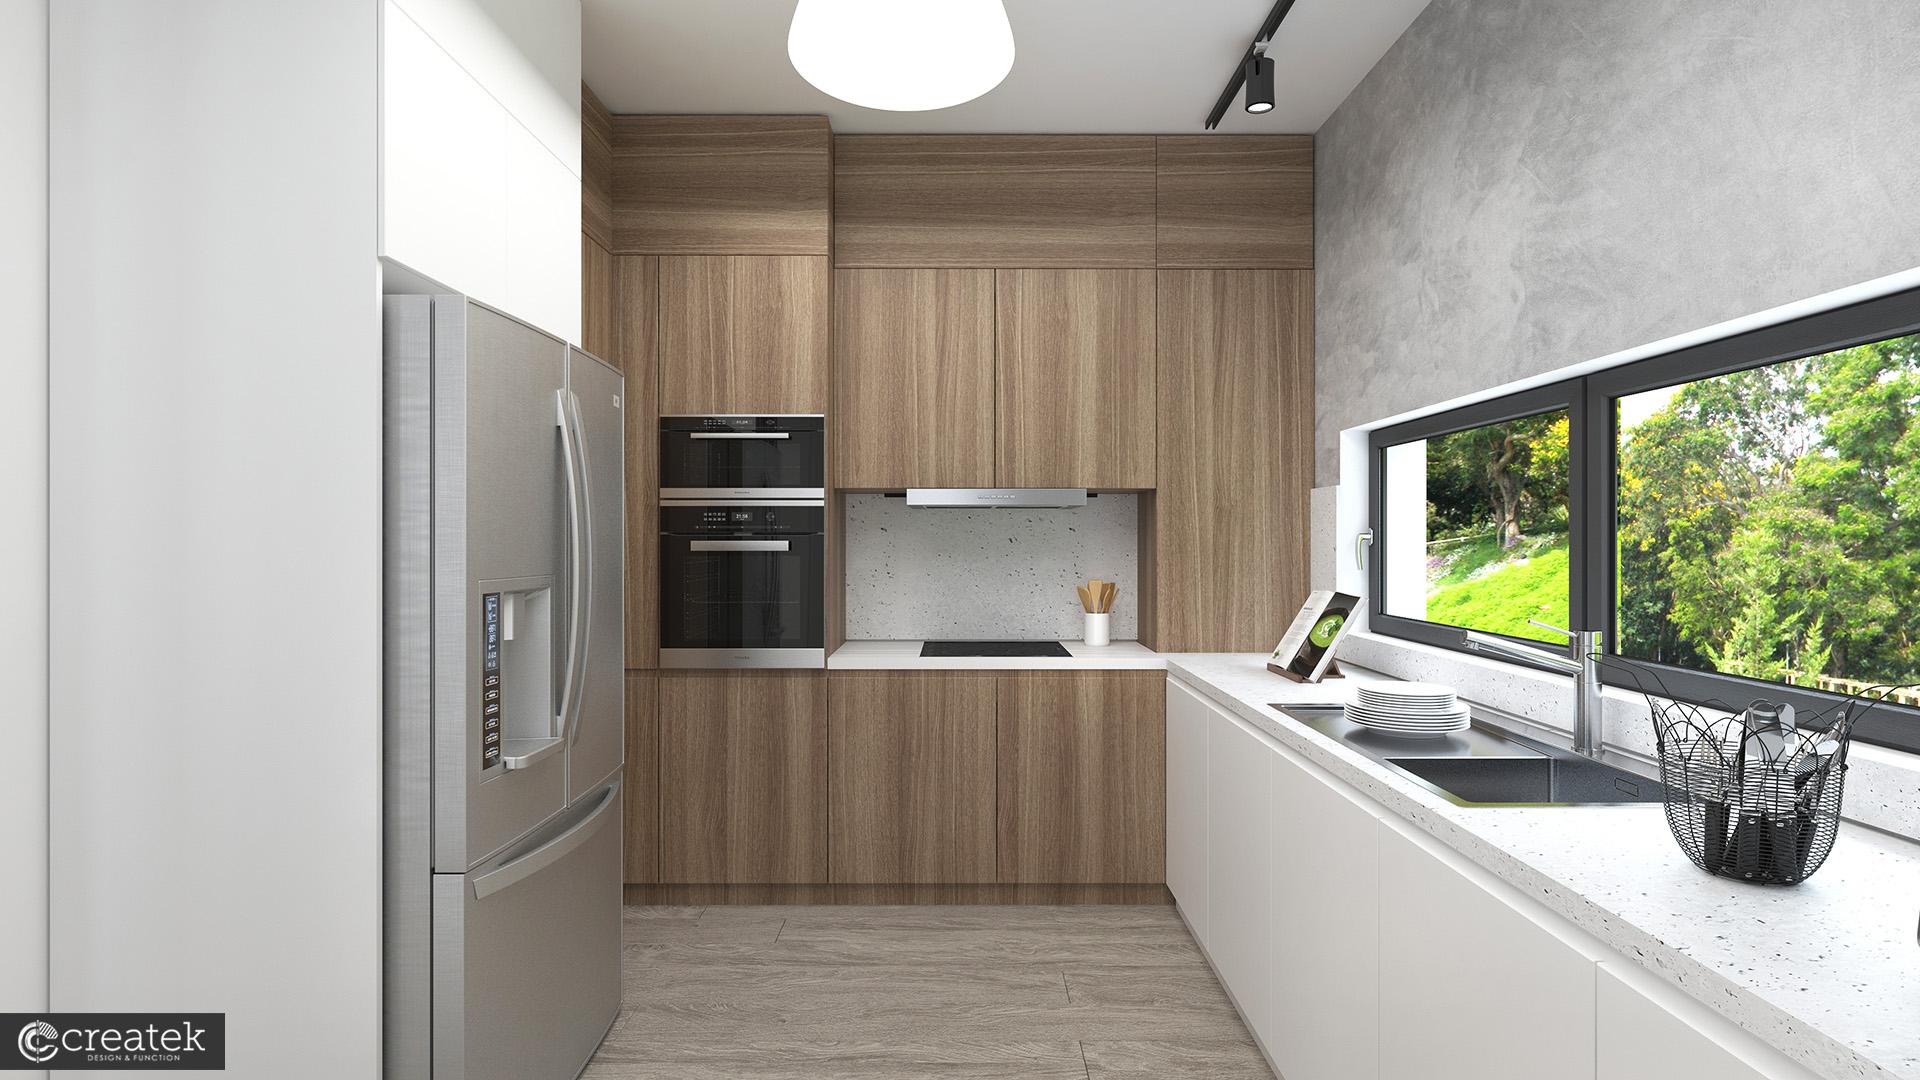 009-Bucatarie-Design-Interior-Casa-Ovidiu-Lac